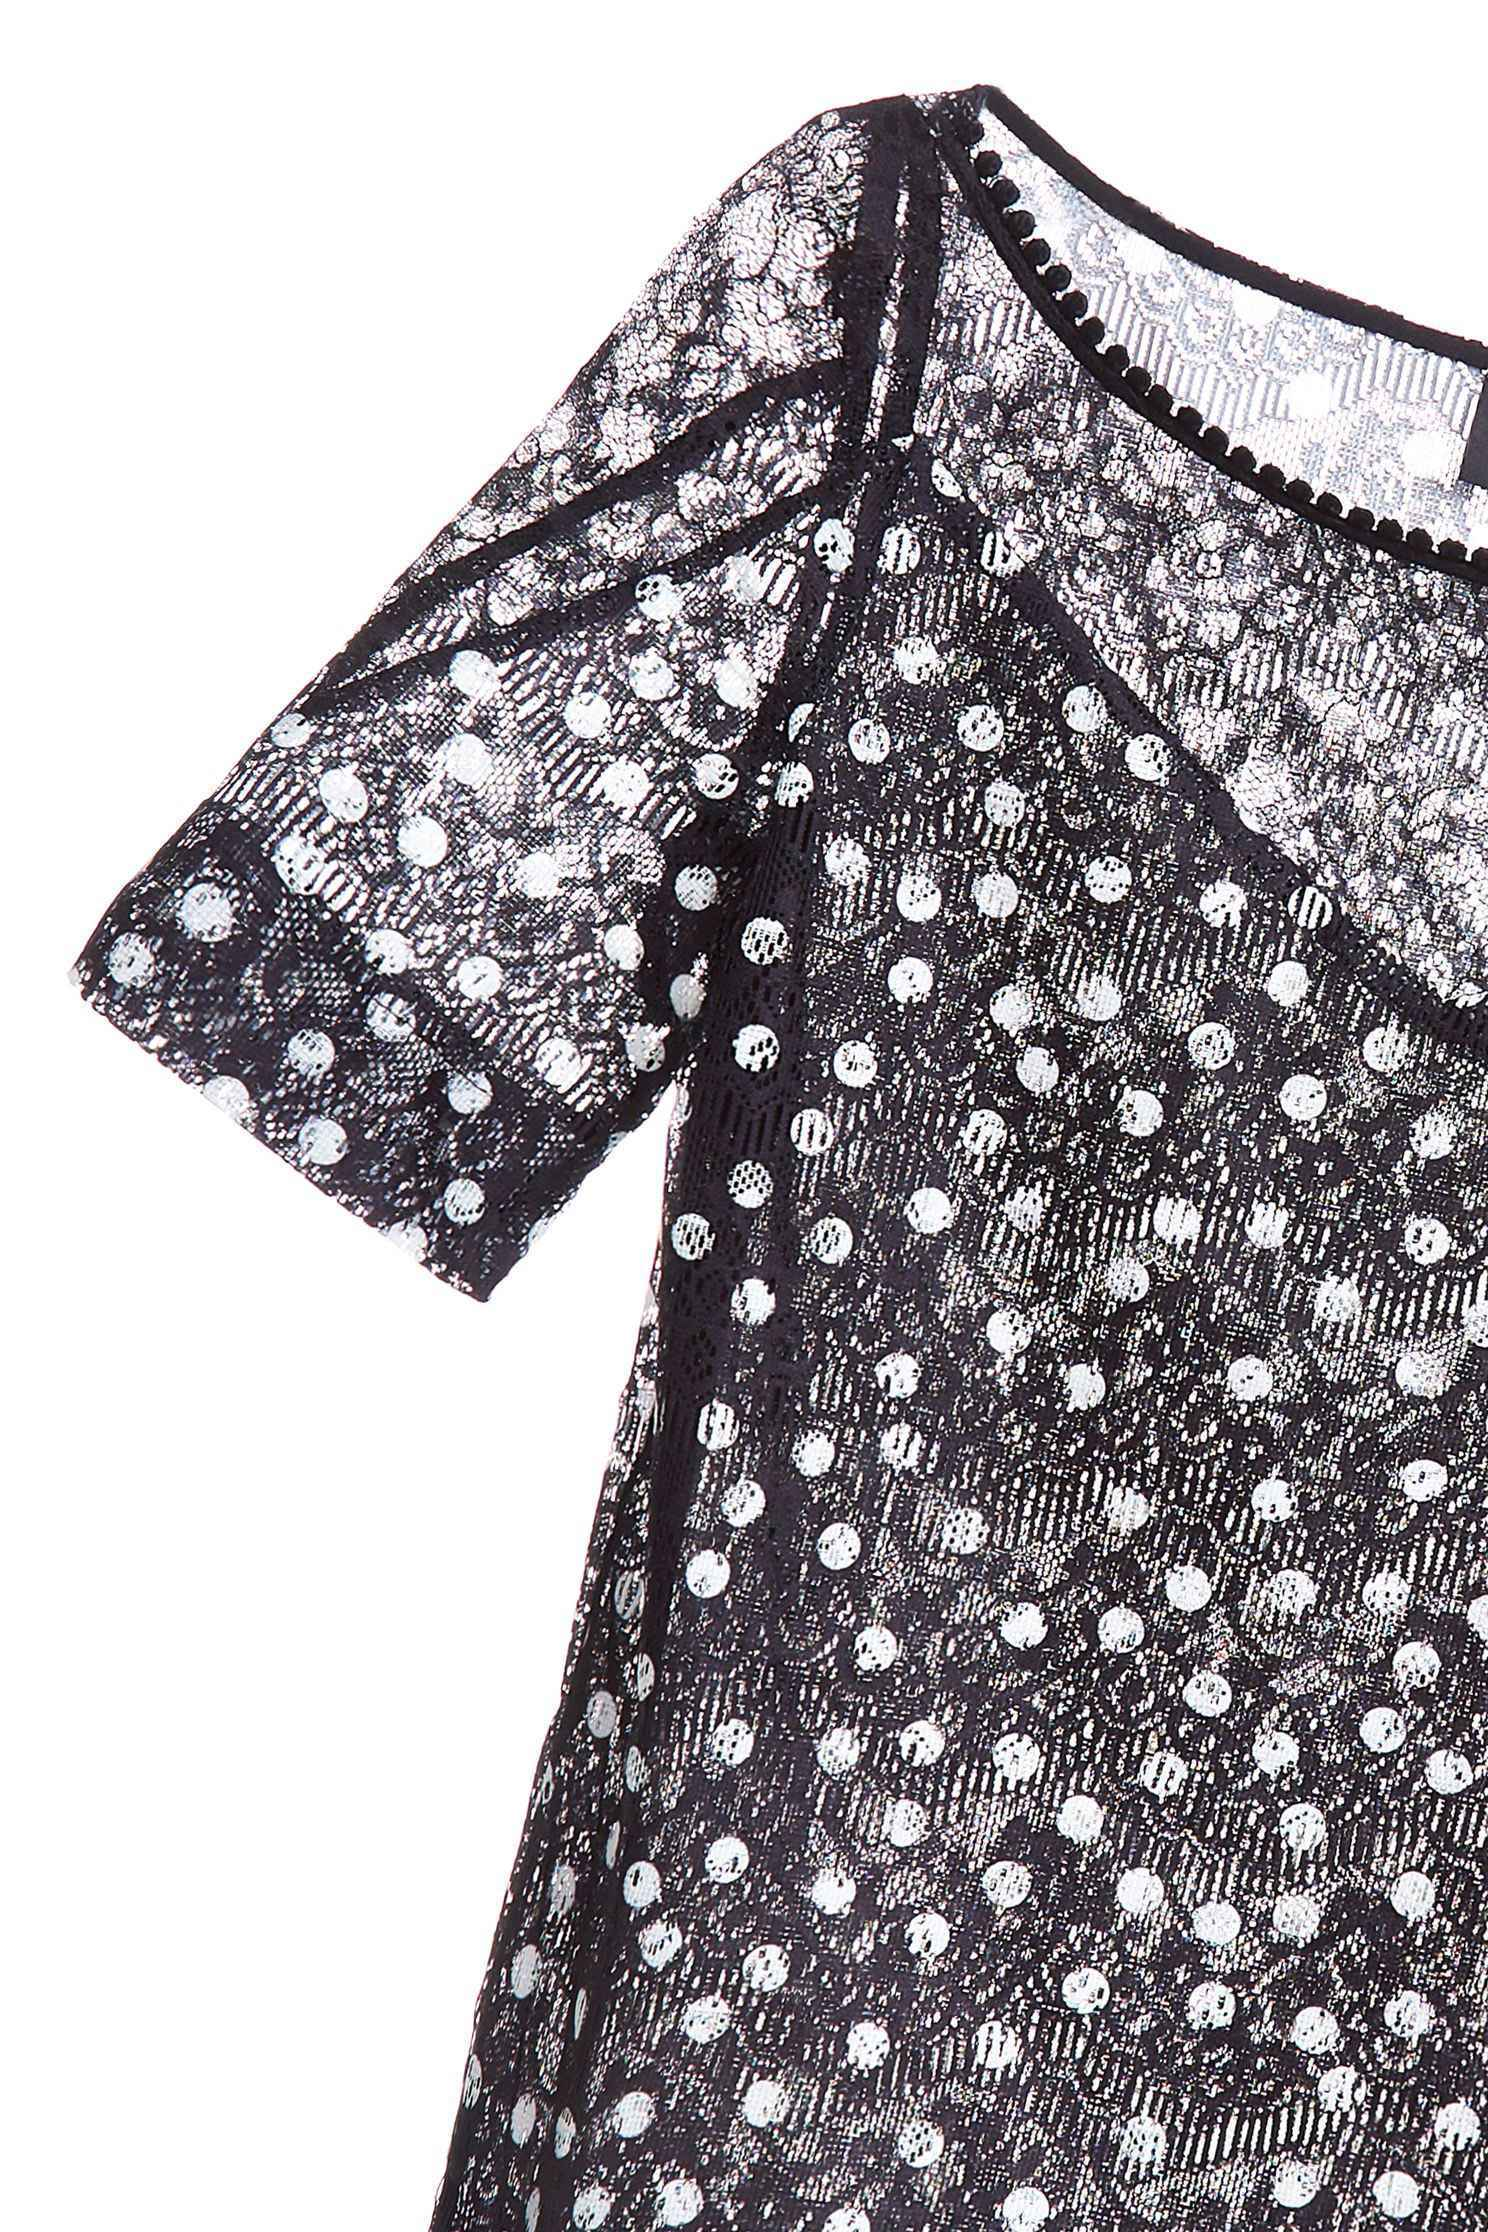 Polka dots lace design top,top,lace,lacedtop,girlfriendsspringtour